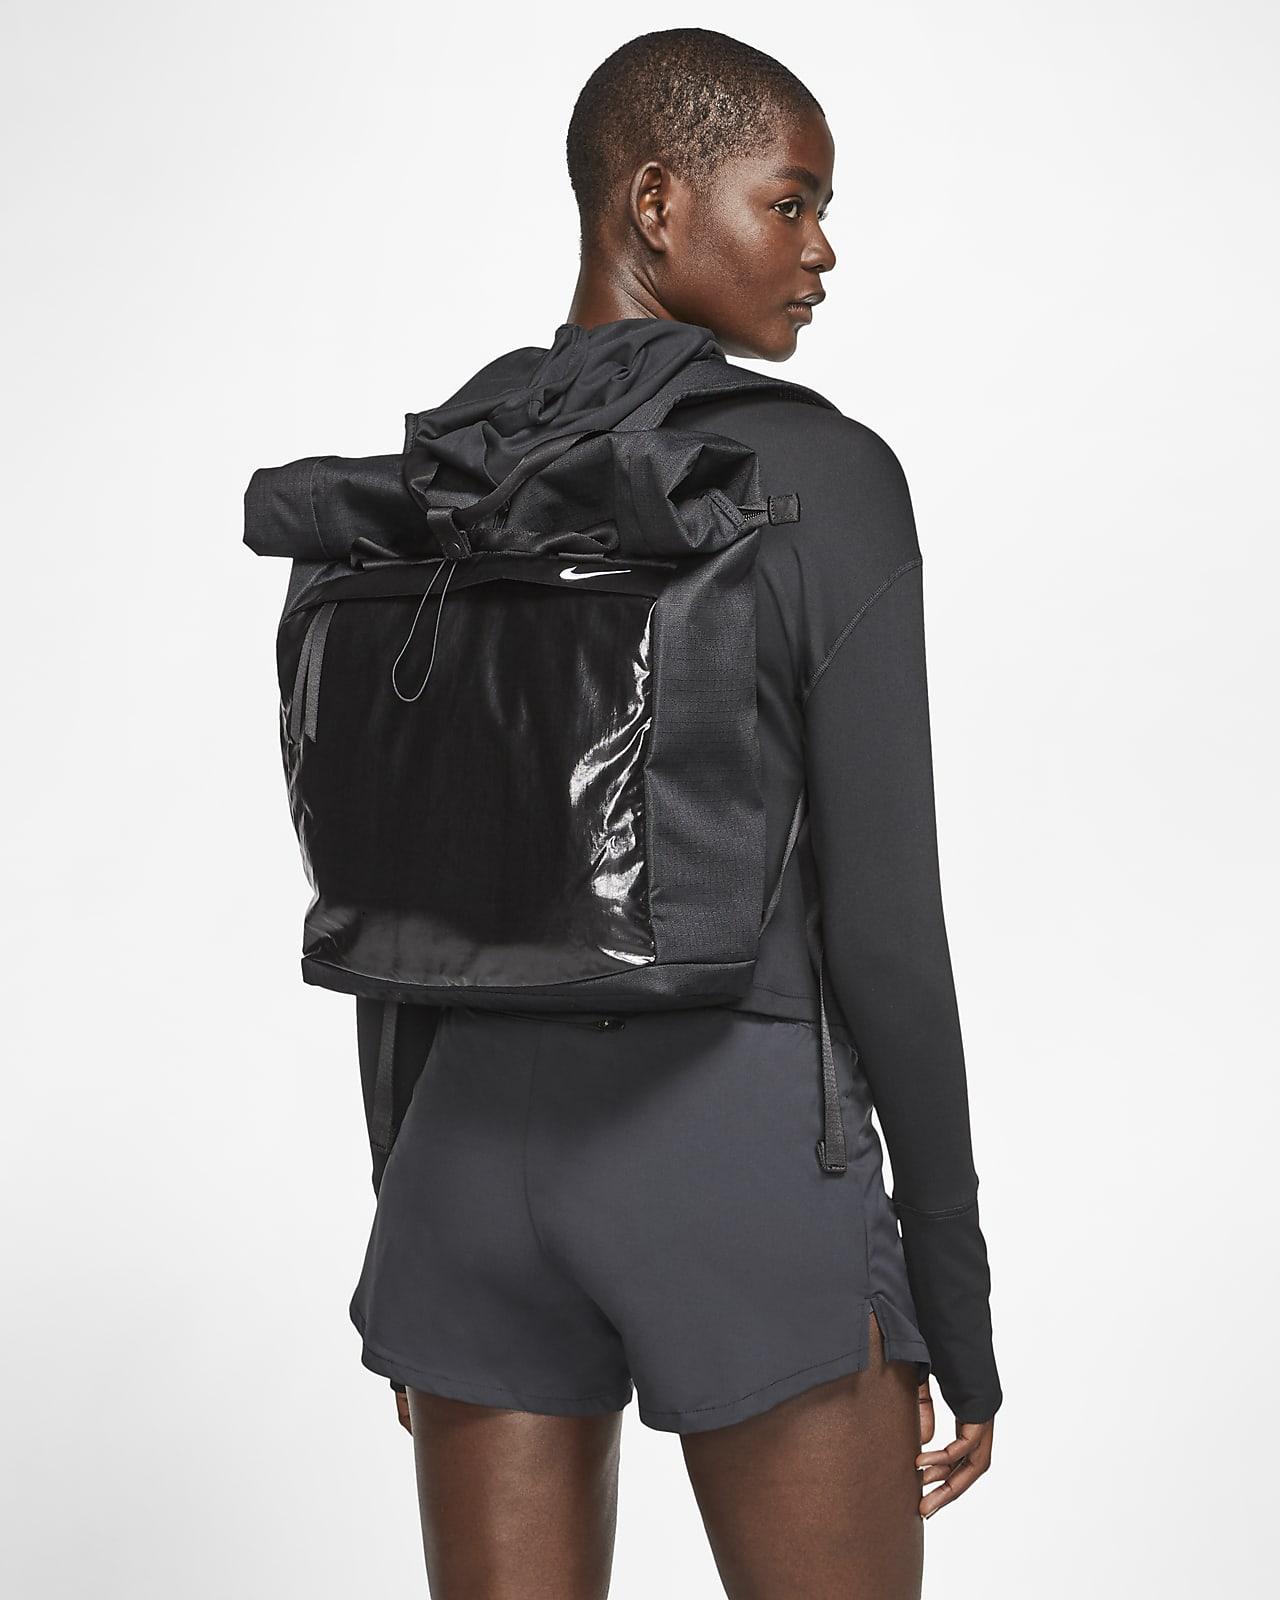 Nike Radiate Women's Training Backpack